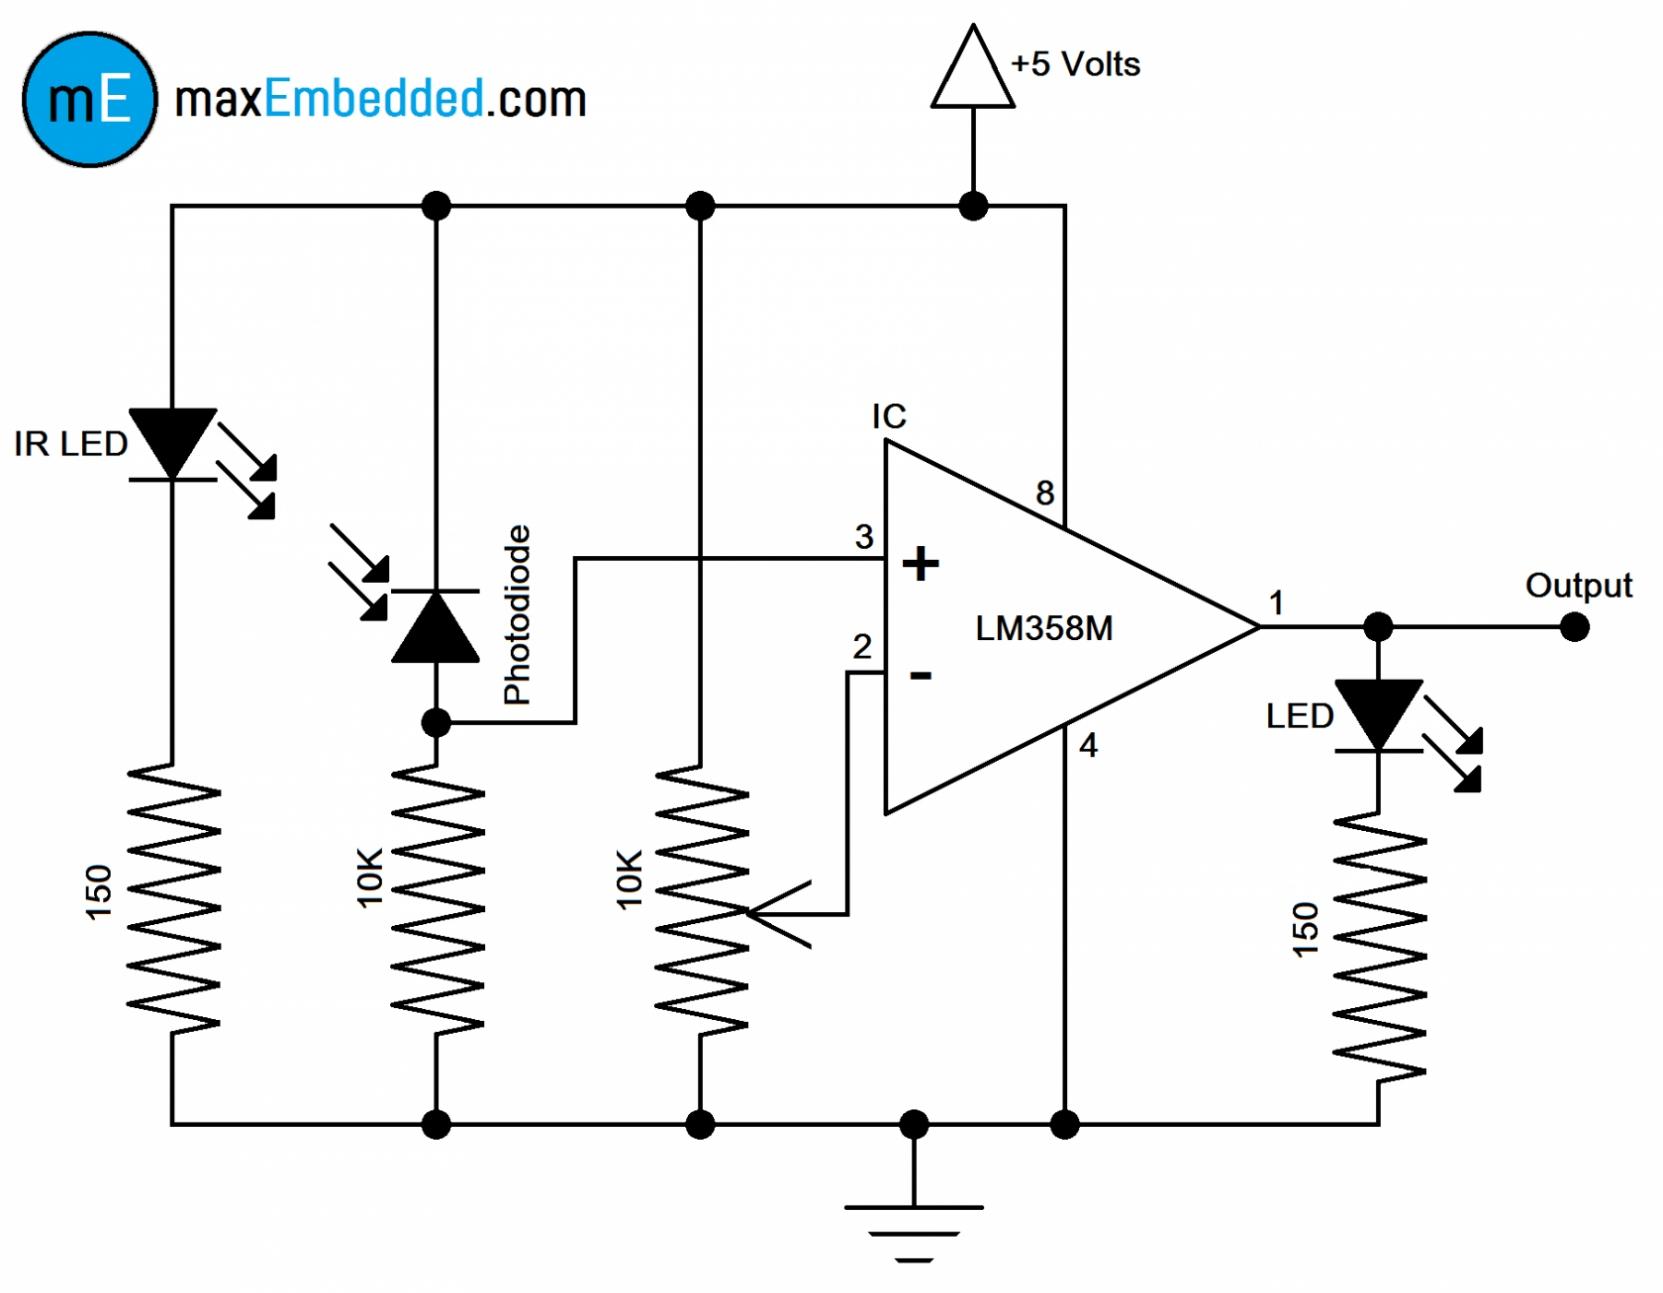 Motion Sensor Light Switch Wiring Diagram – Dorable Motion Sensor - Motion Sensor Light Switch Wiring Diagram